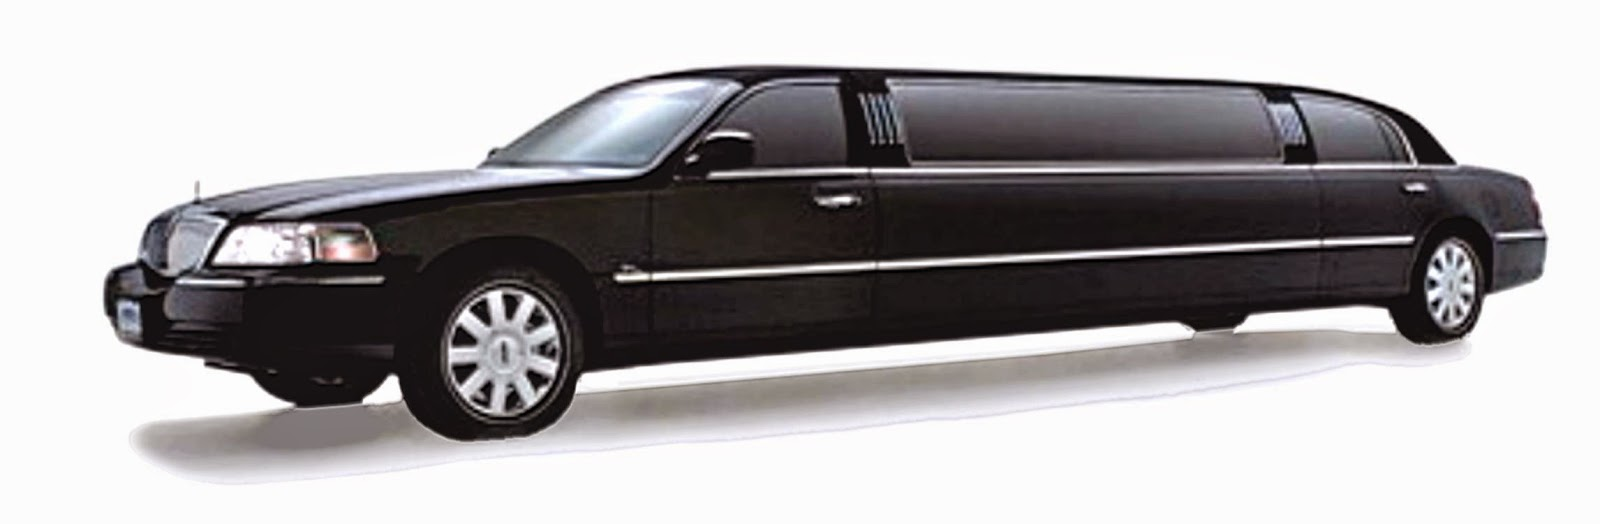 Origin of the word limousine